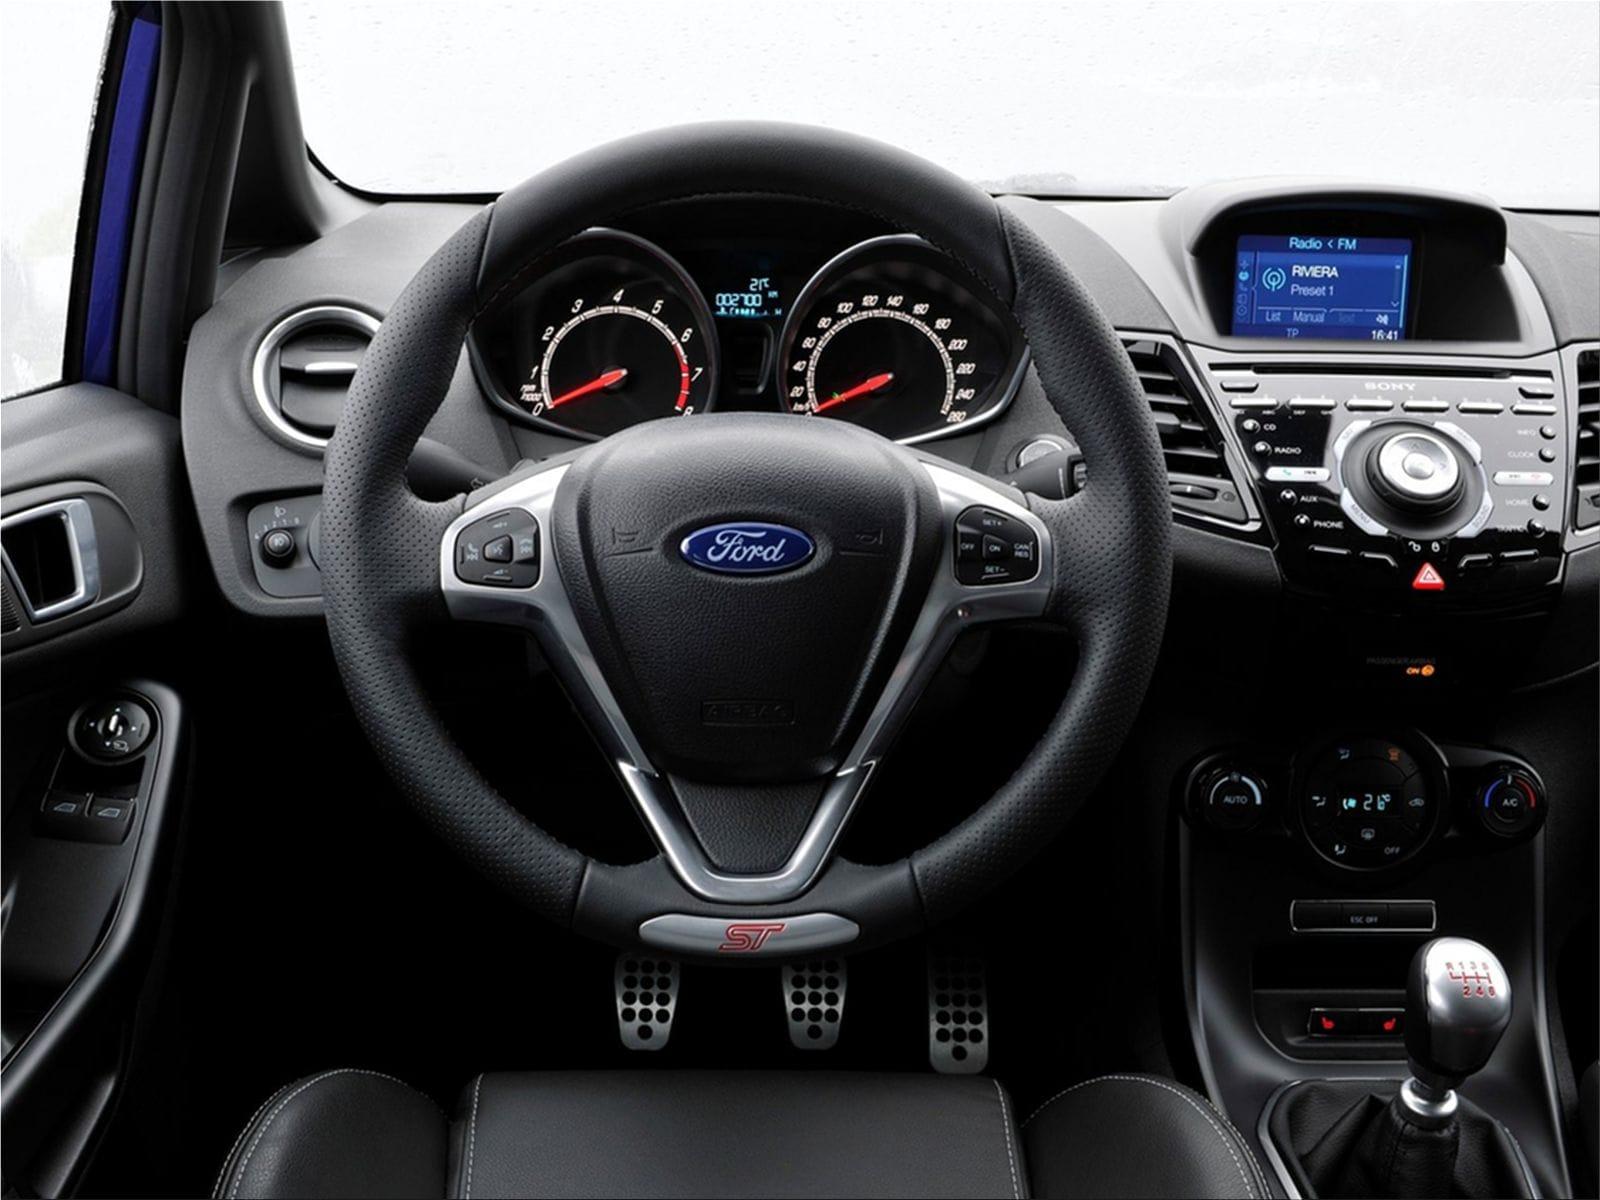 2013 ford fiesta manual transmission